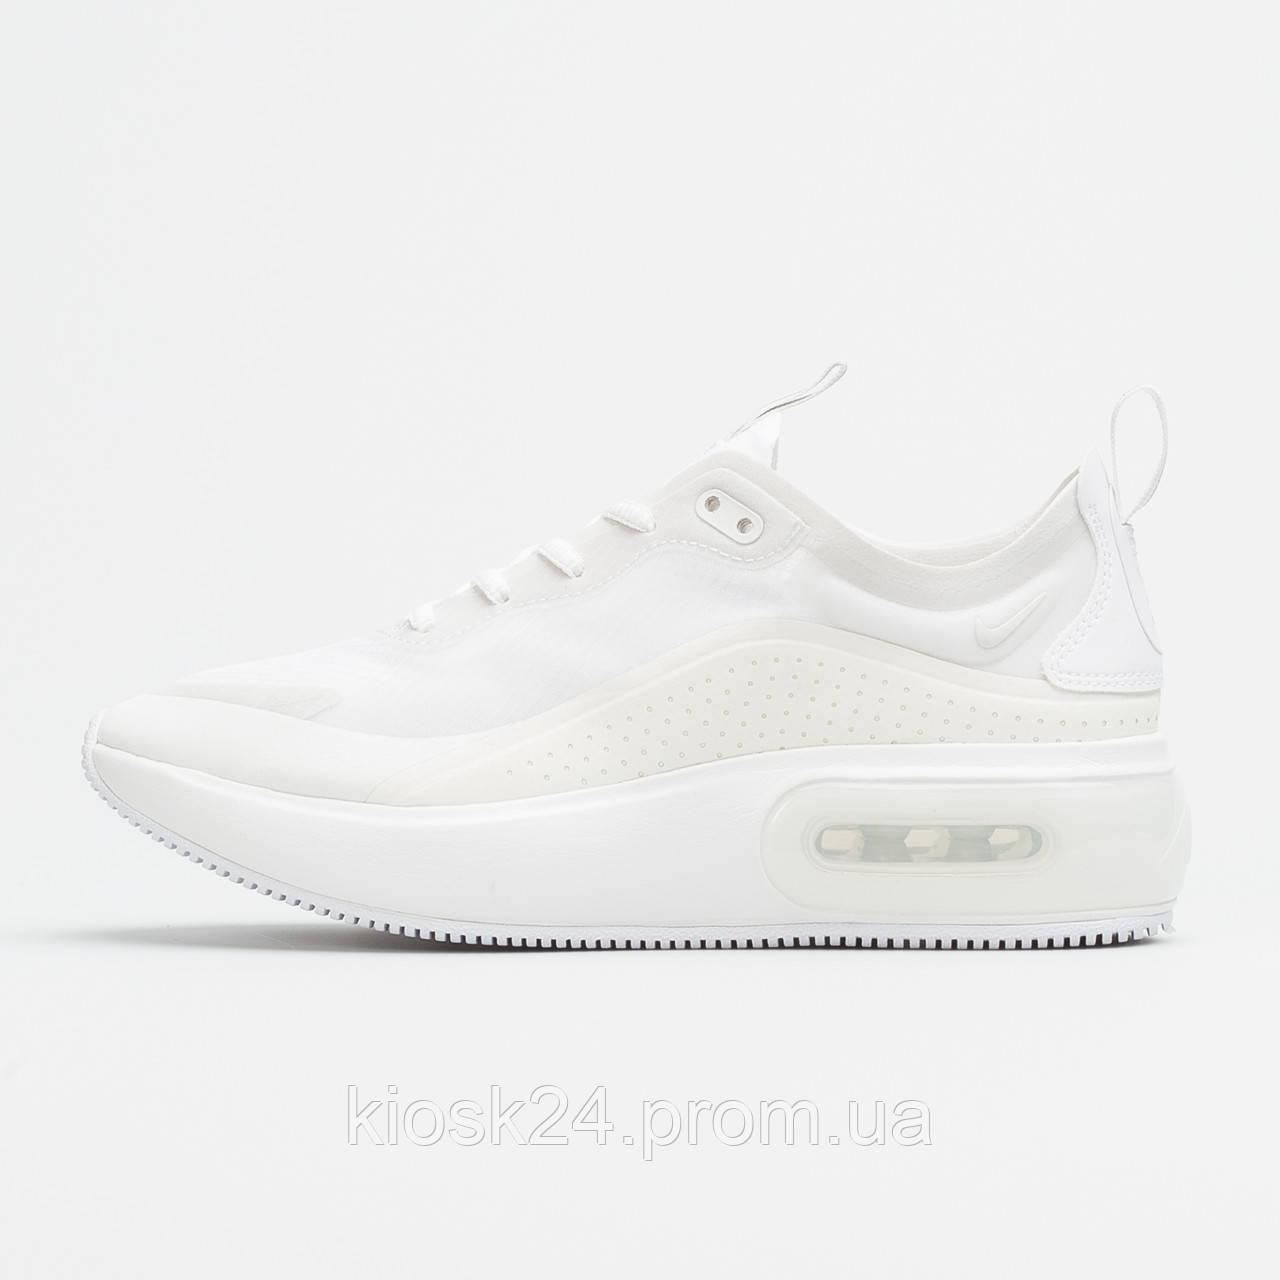 d319cb9f Оригинальные кроссовки Nike Wmns Air Max Dia SE (AR7410-105) - Sneakersbox -